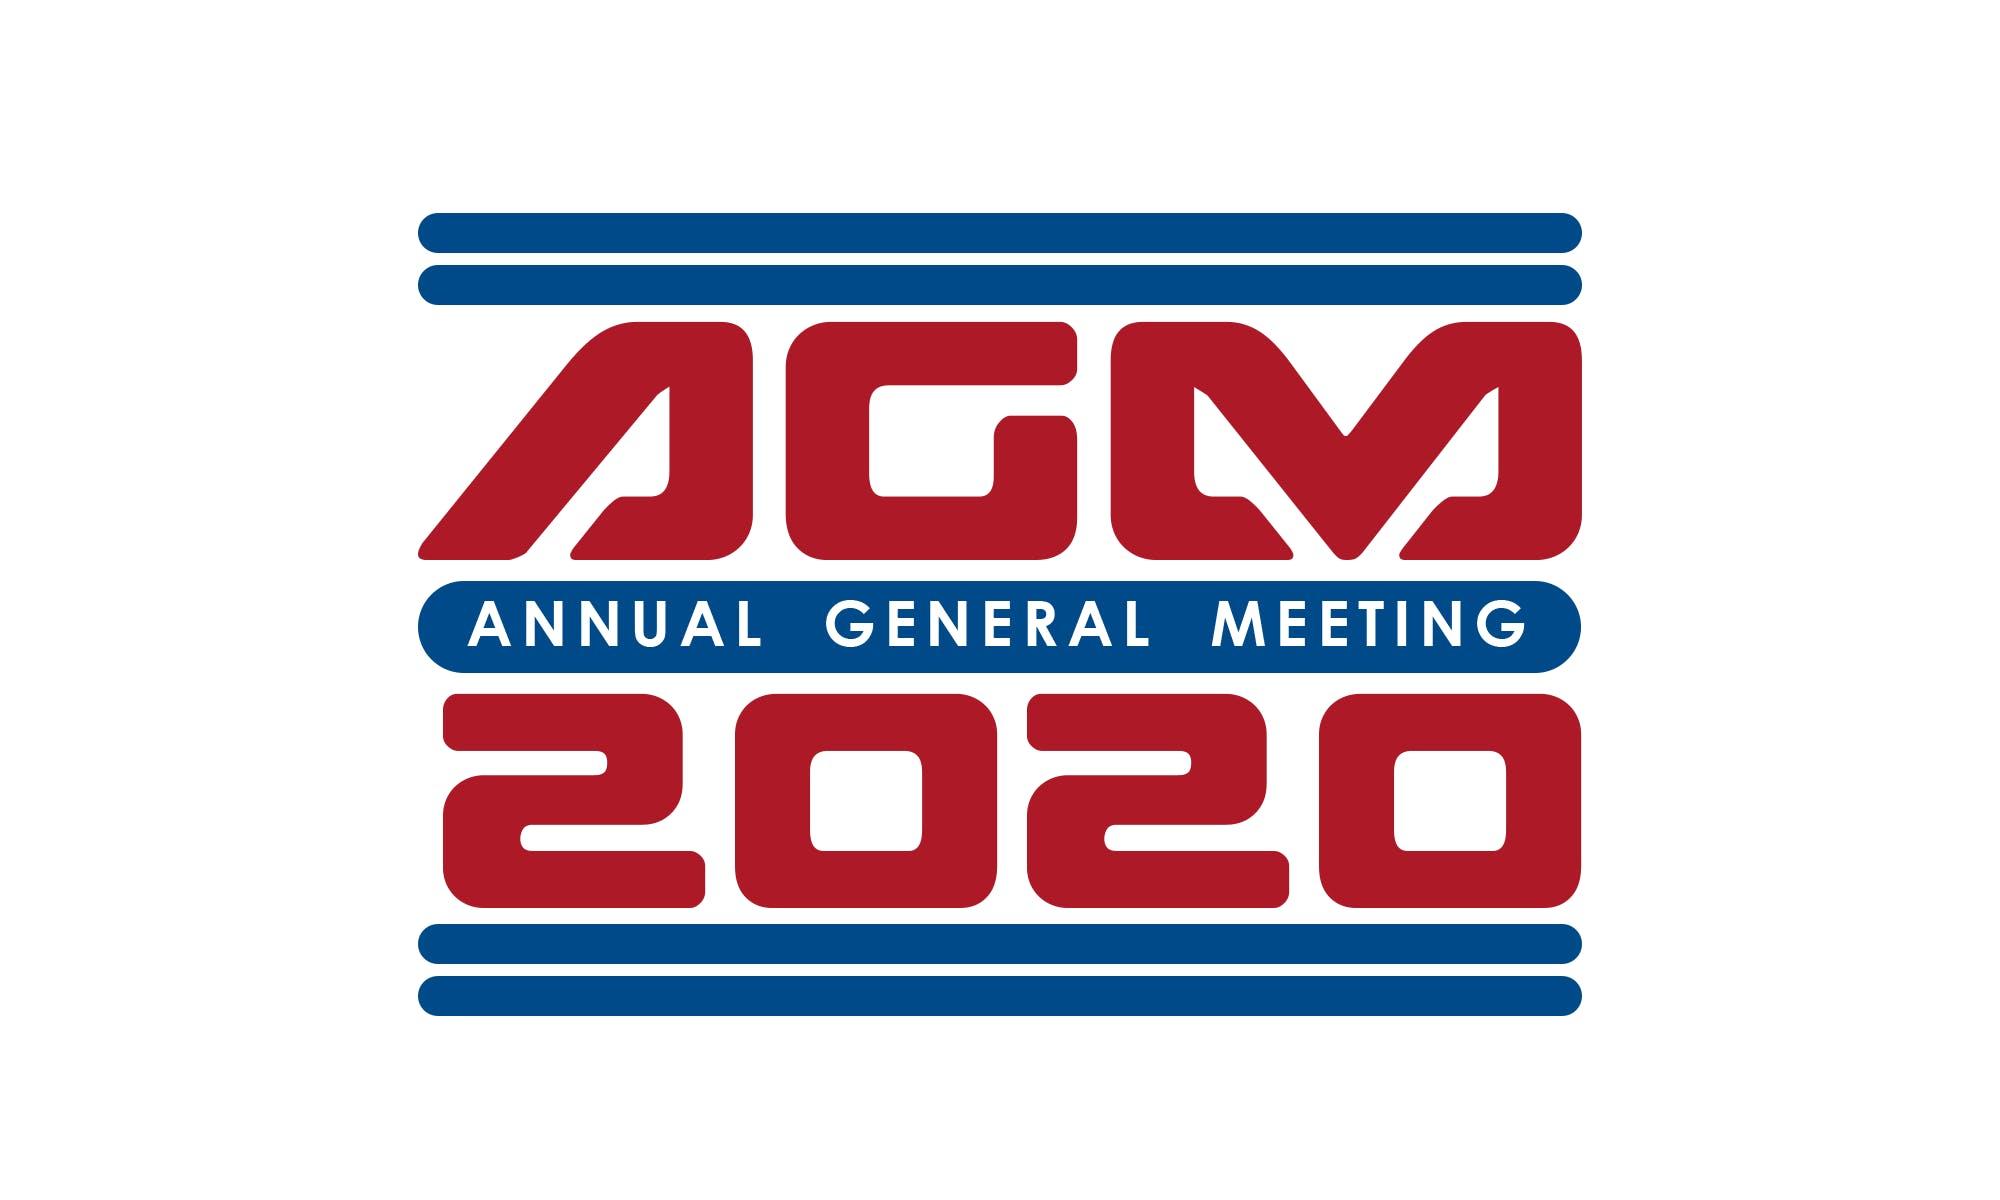 Annual General Meeting Logo